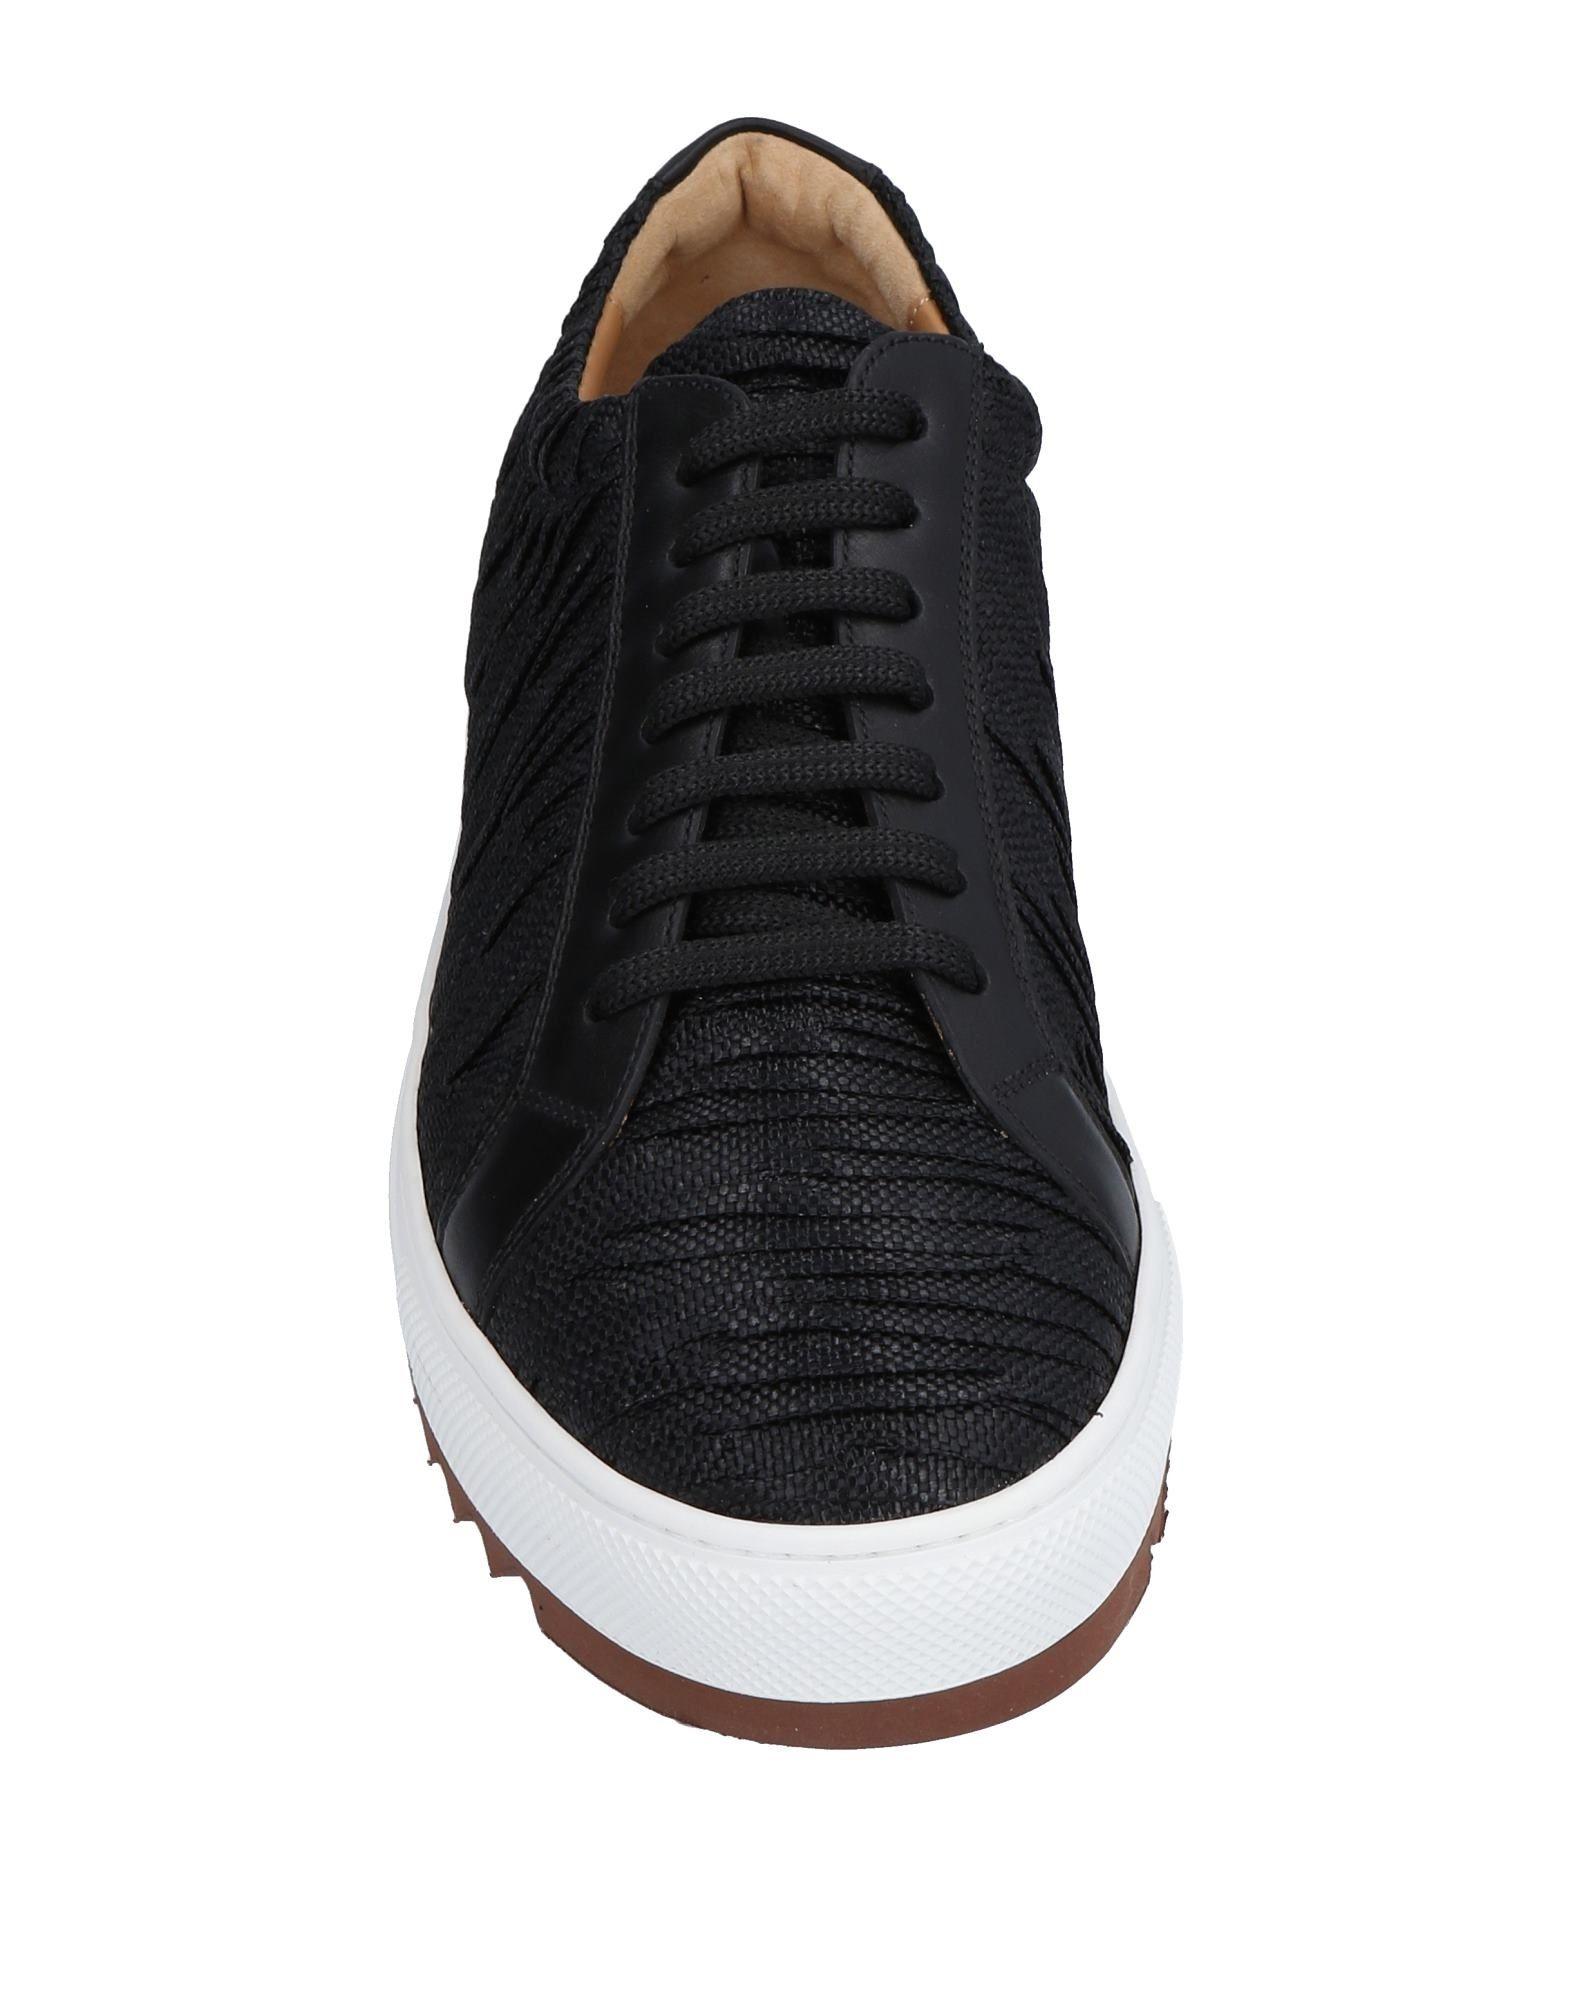 Salvatore Ferragamo Sneakers Herren  Schuhe 11397828UF Gute Qualität beliebte Schuhe  3a942e